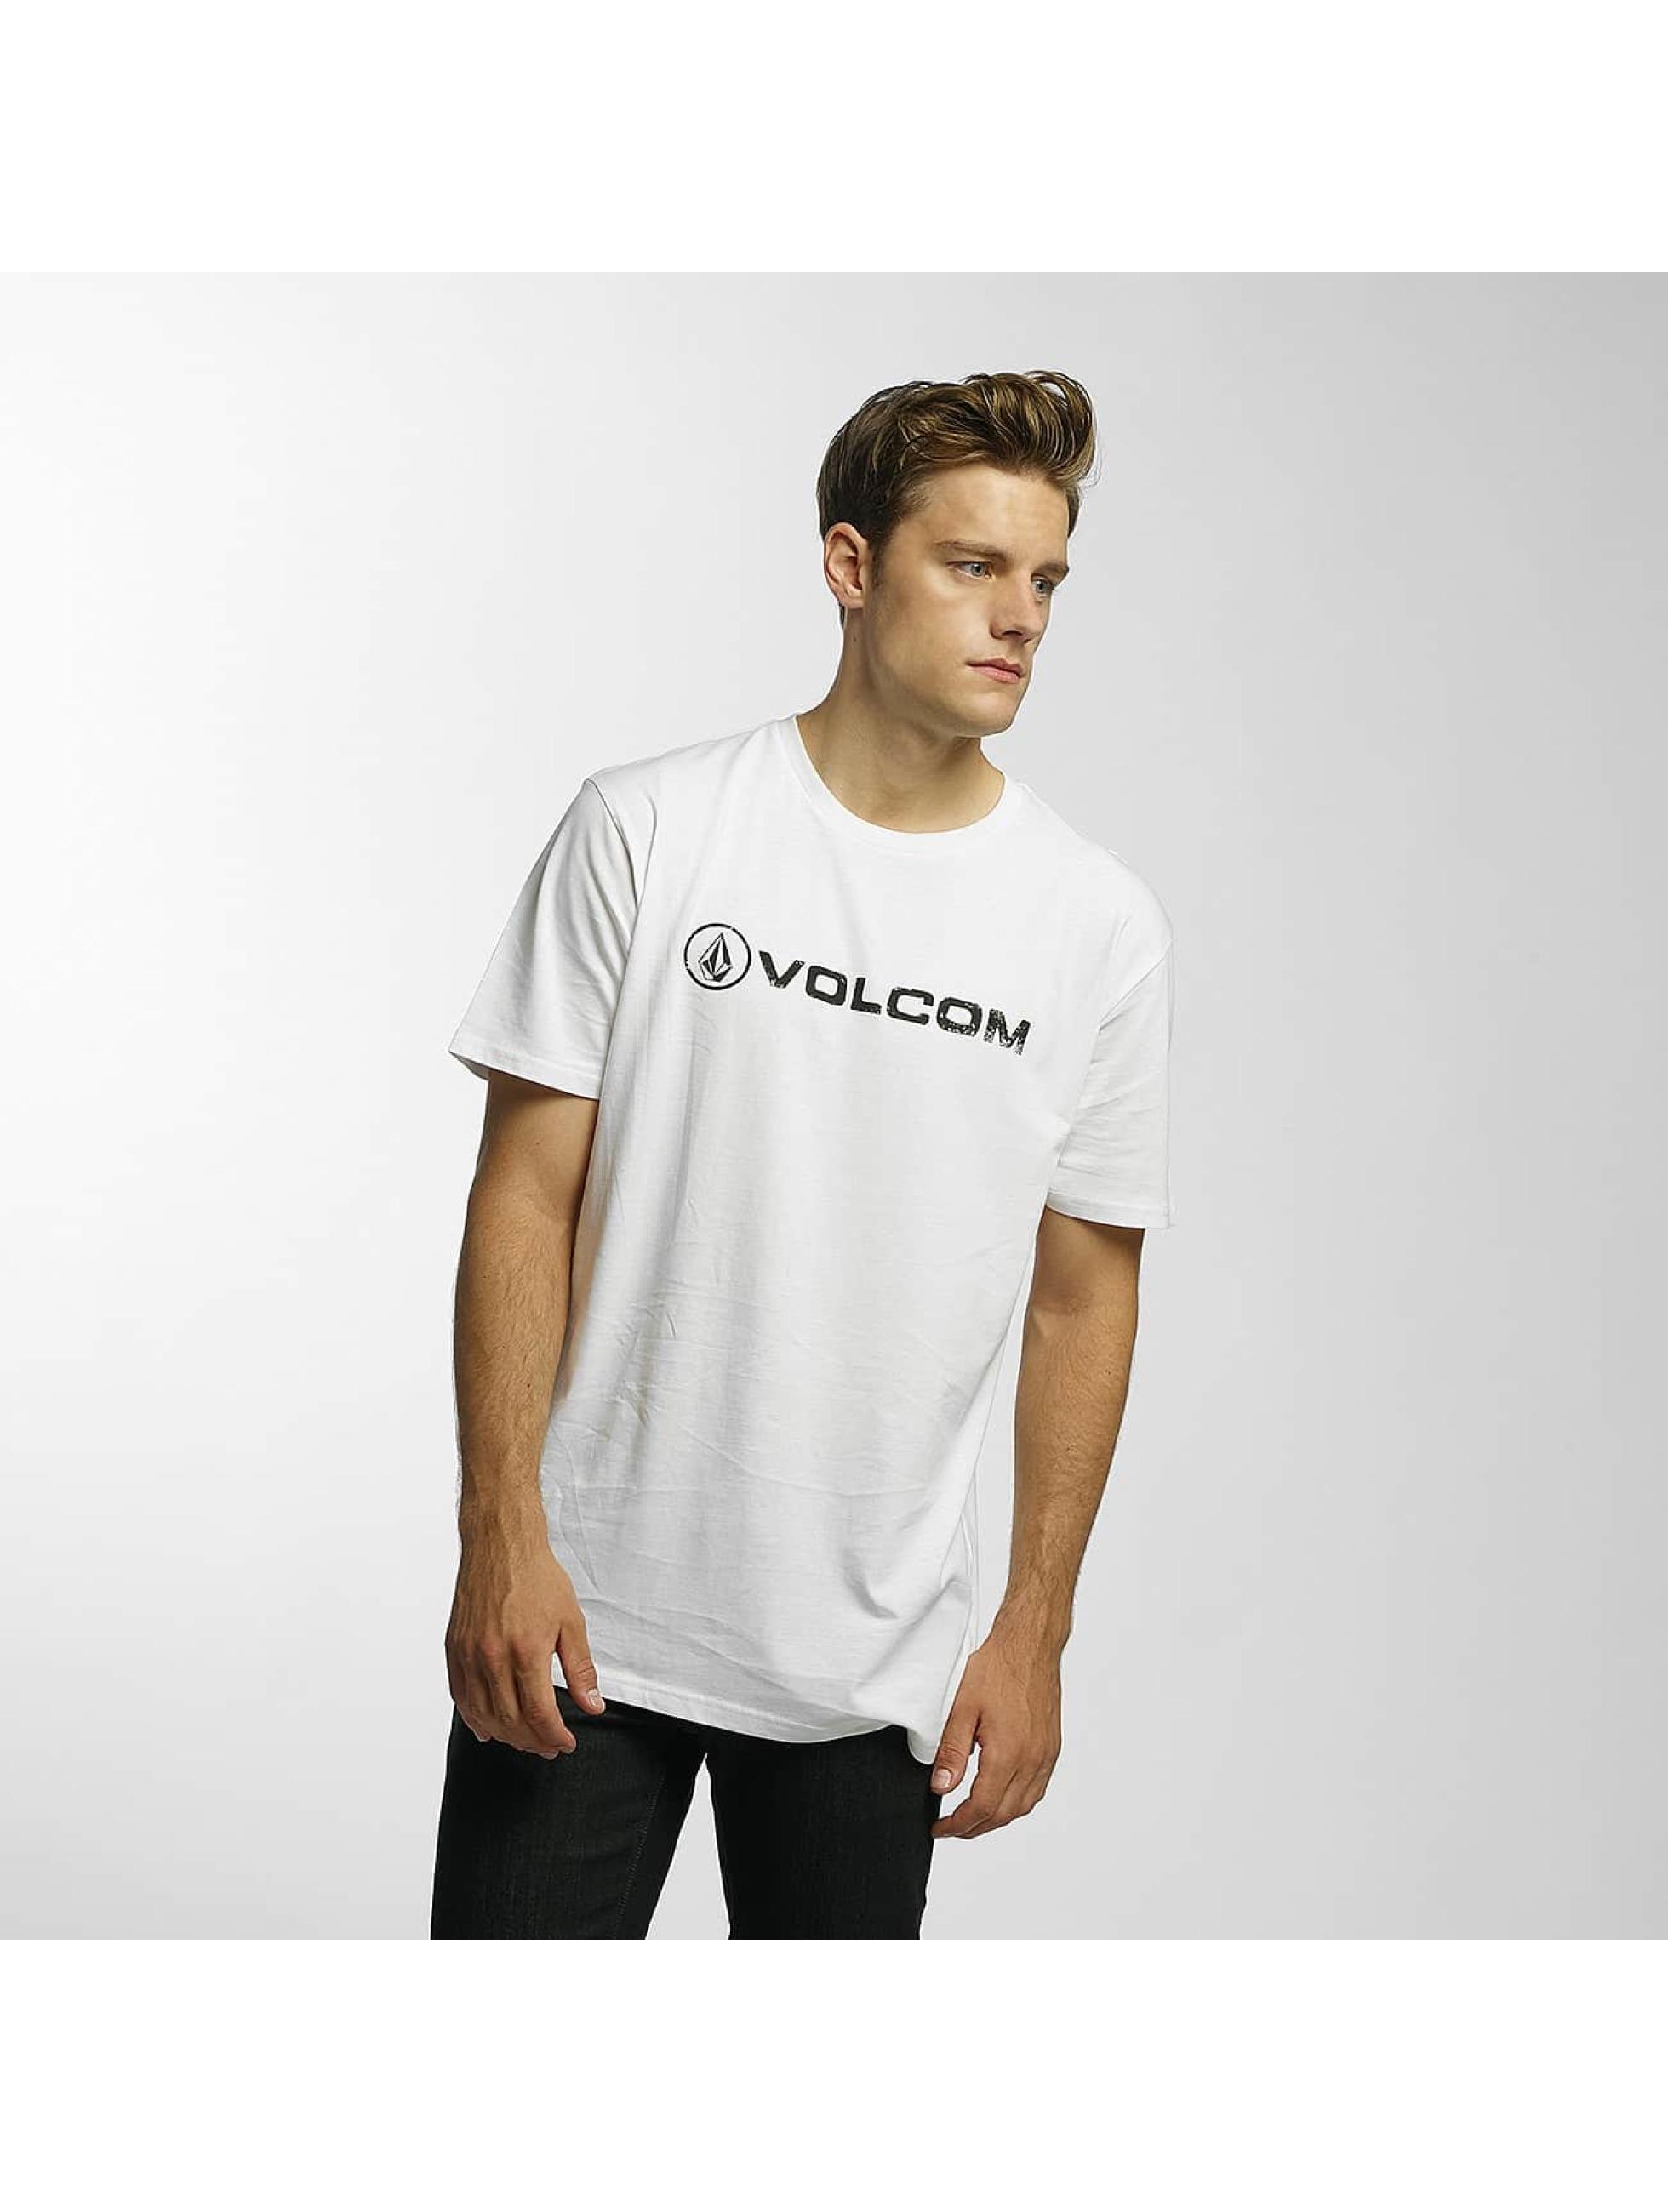 Volcom T-paidat Line Euro Basic valkoinen